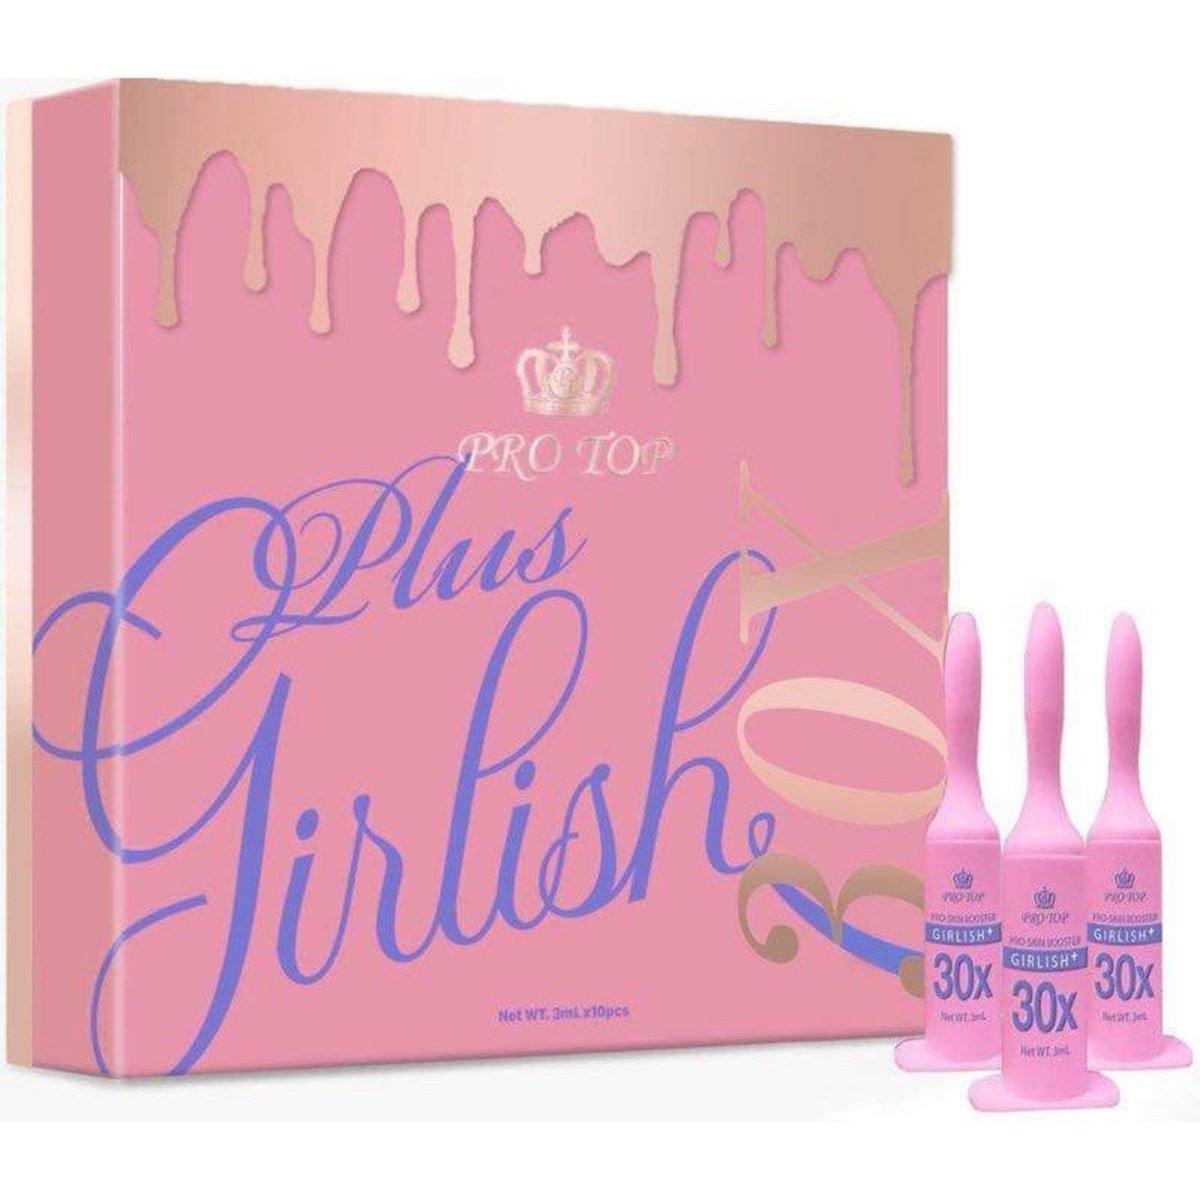 PROTOP Pro Skin Booster GIRLISH Plus 30 x 收毛孔納米新版少女針  (10支 x 3ml)粉盒